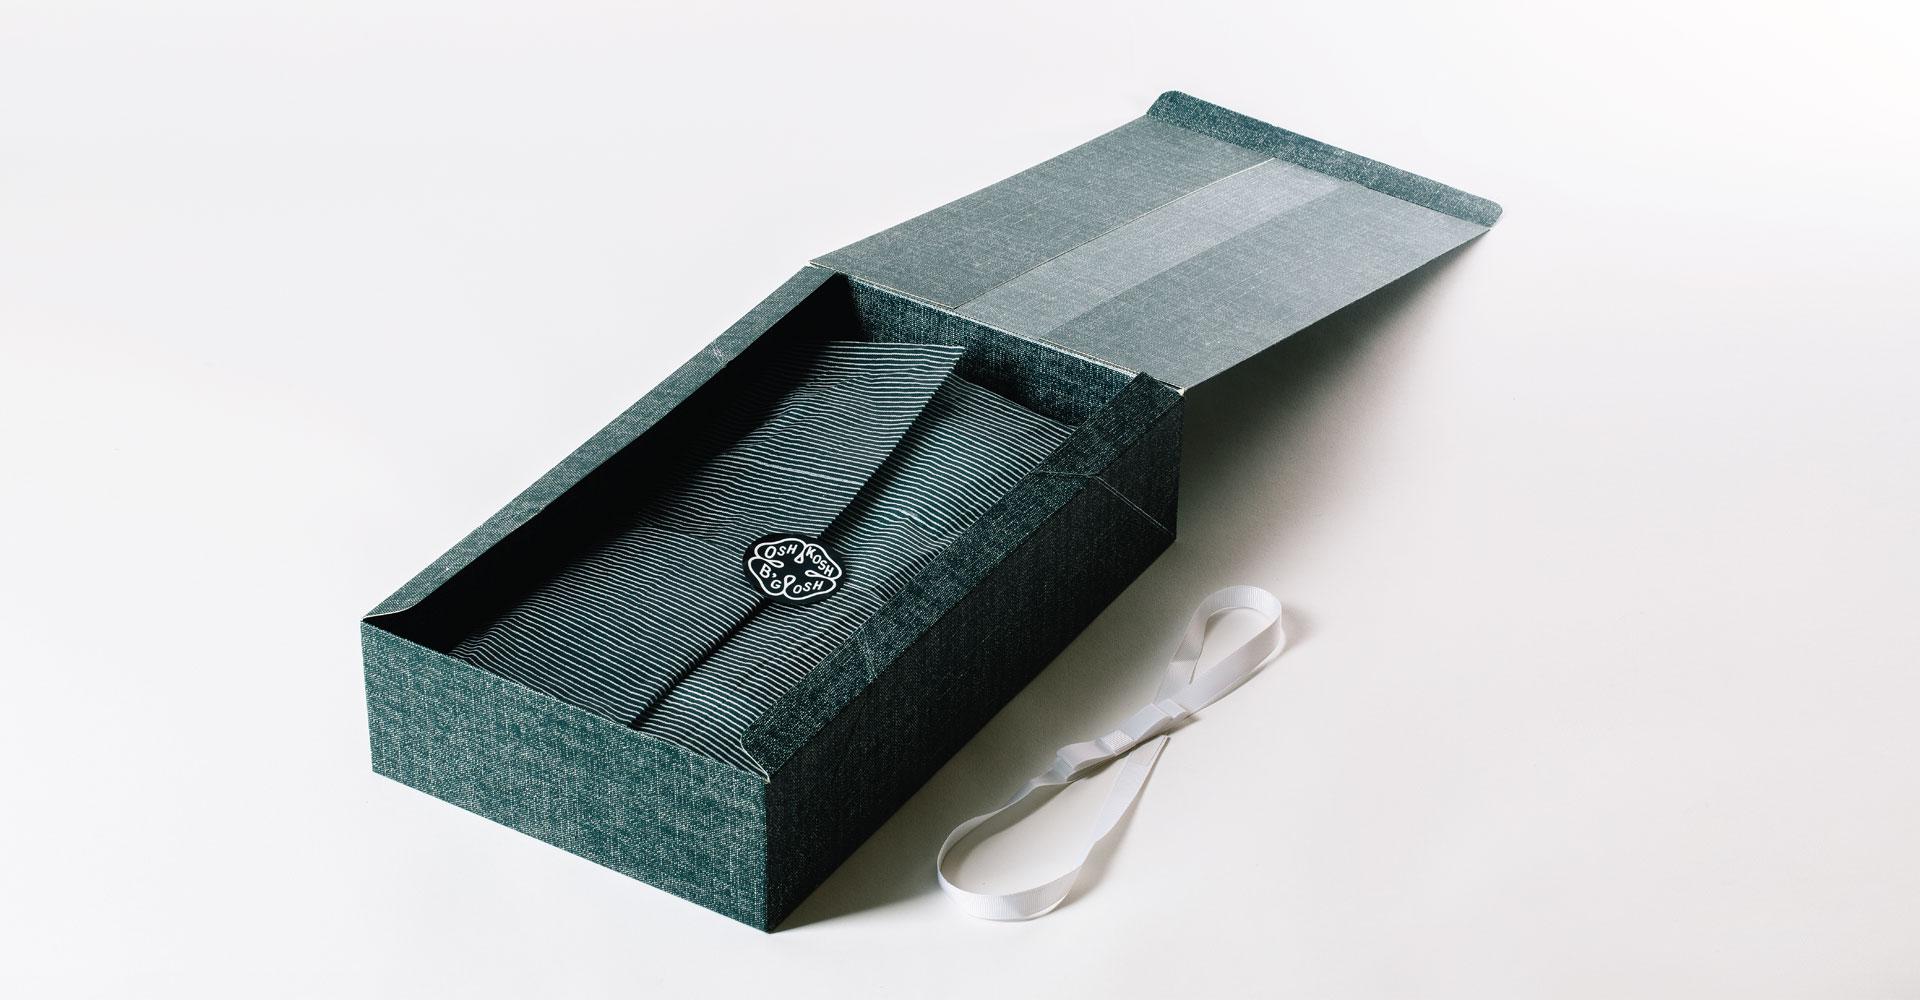 Creative_Retail_Packaging_Package_Design_OshKosh_Bgosh_04.jpg